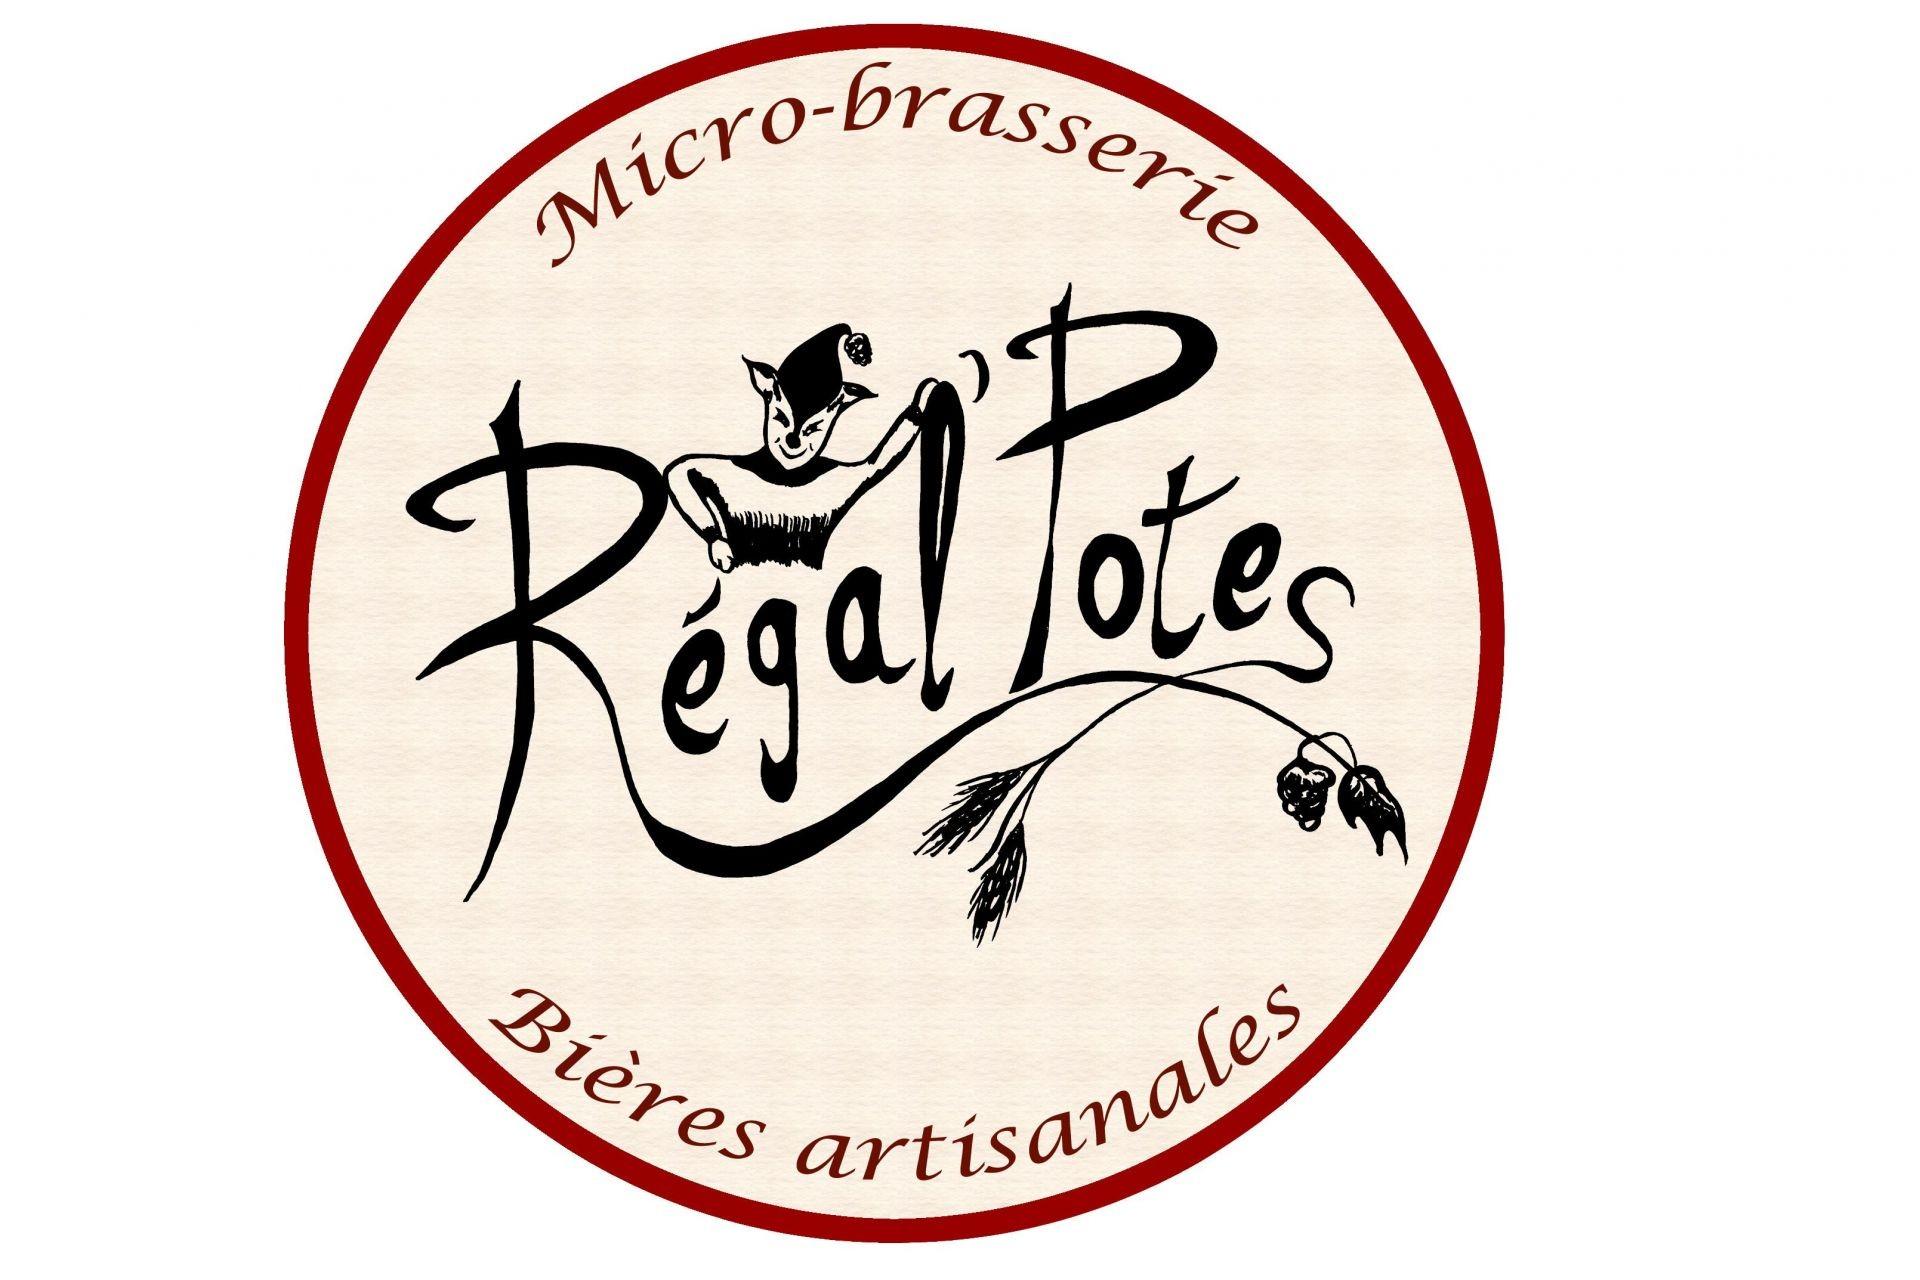 Microbrasserie Régal Potes